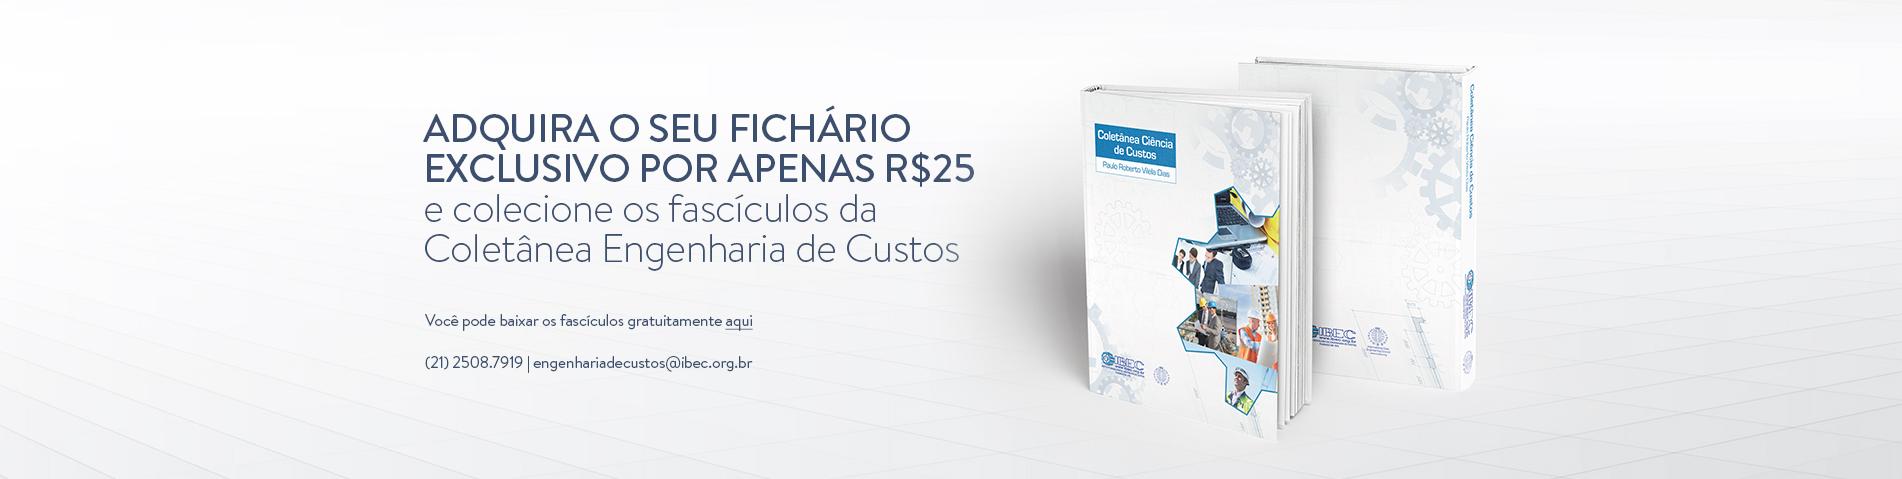 banner_portal_adquira_seu_fichario